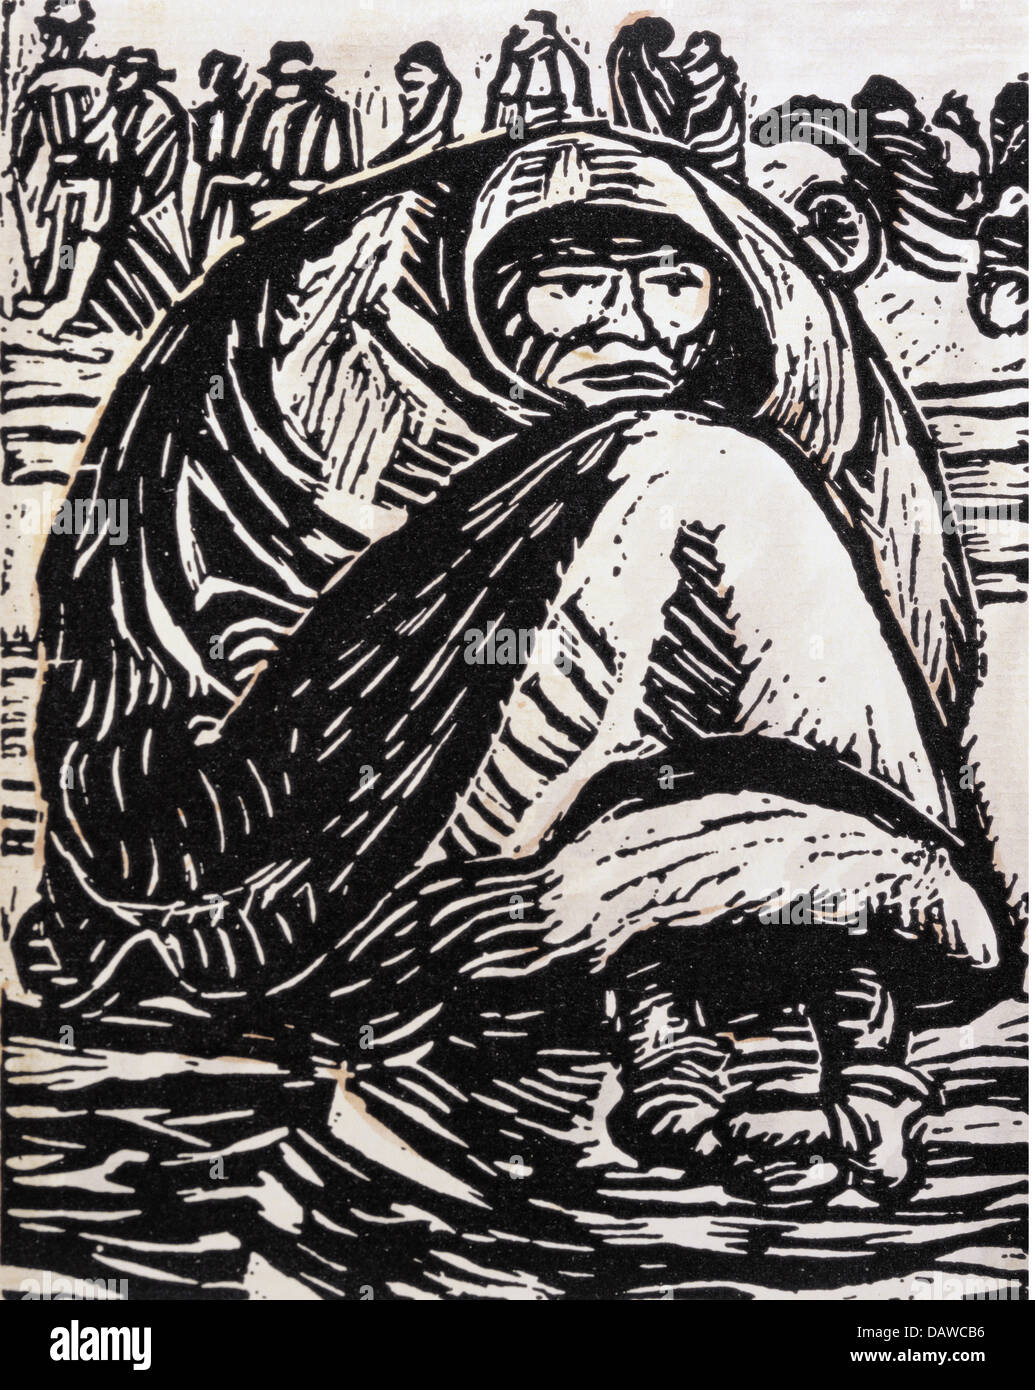 "Bildende Kunst, Barlach, Ernst (1870-1938), Grafik, ""sterben"" Armut """" (not), Holzschnitt, Deutschland, Stockbild"